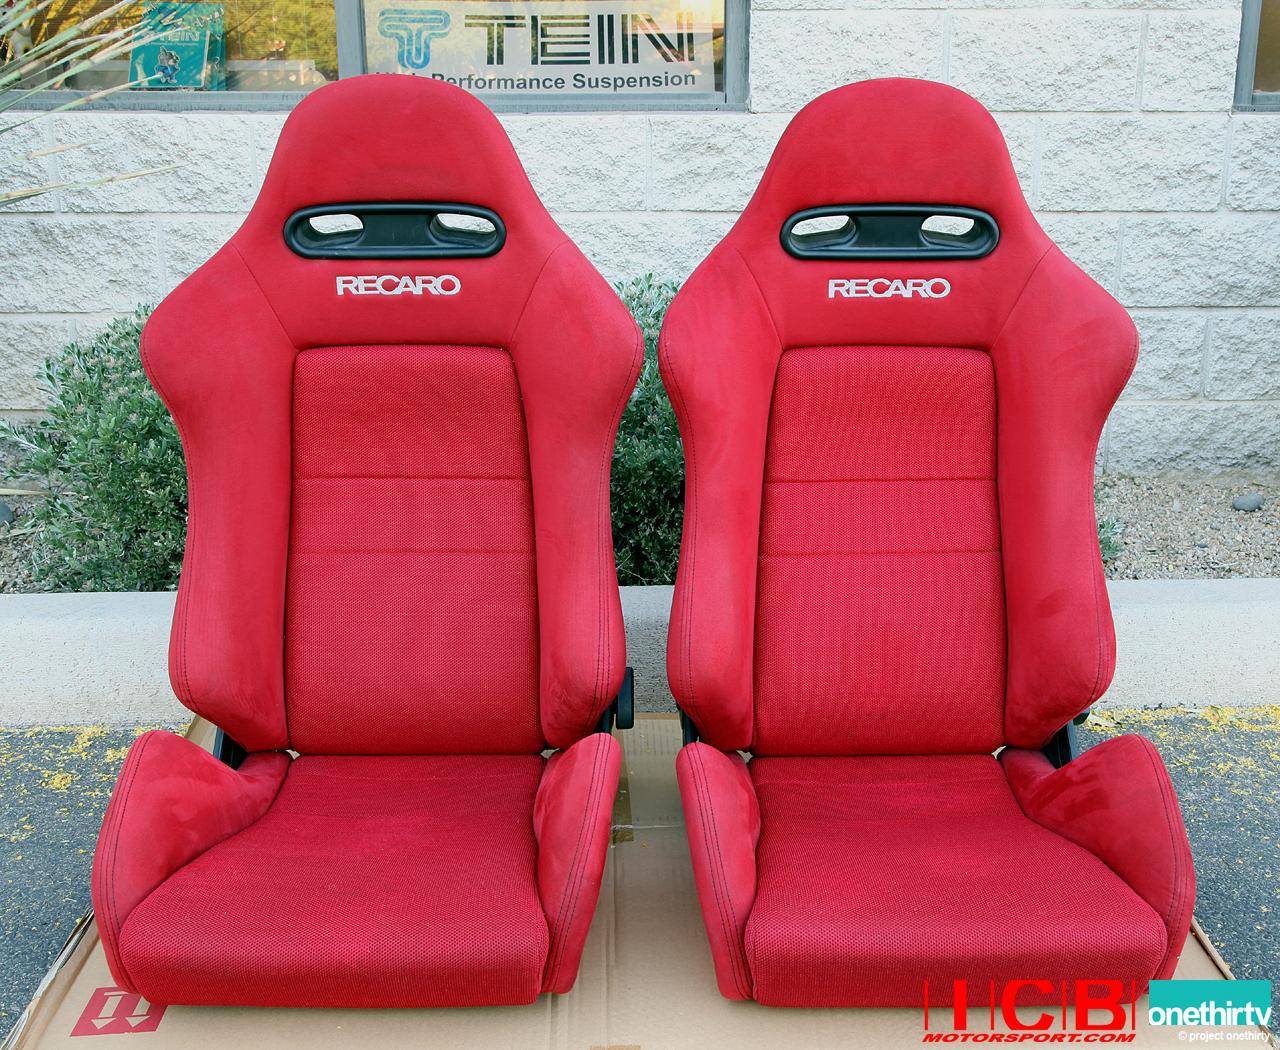 Used Jdm Integra Dc5 Red Recaro Seats Condition 9 25 10 Sold